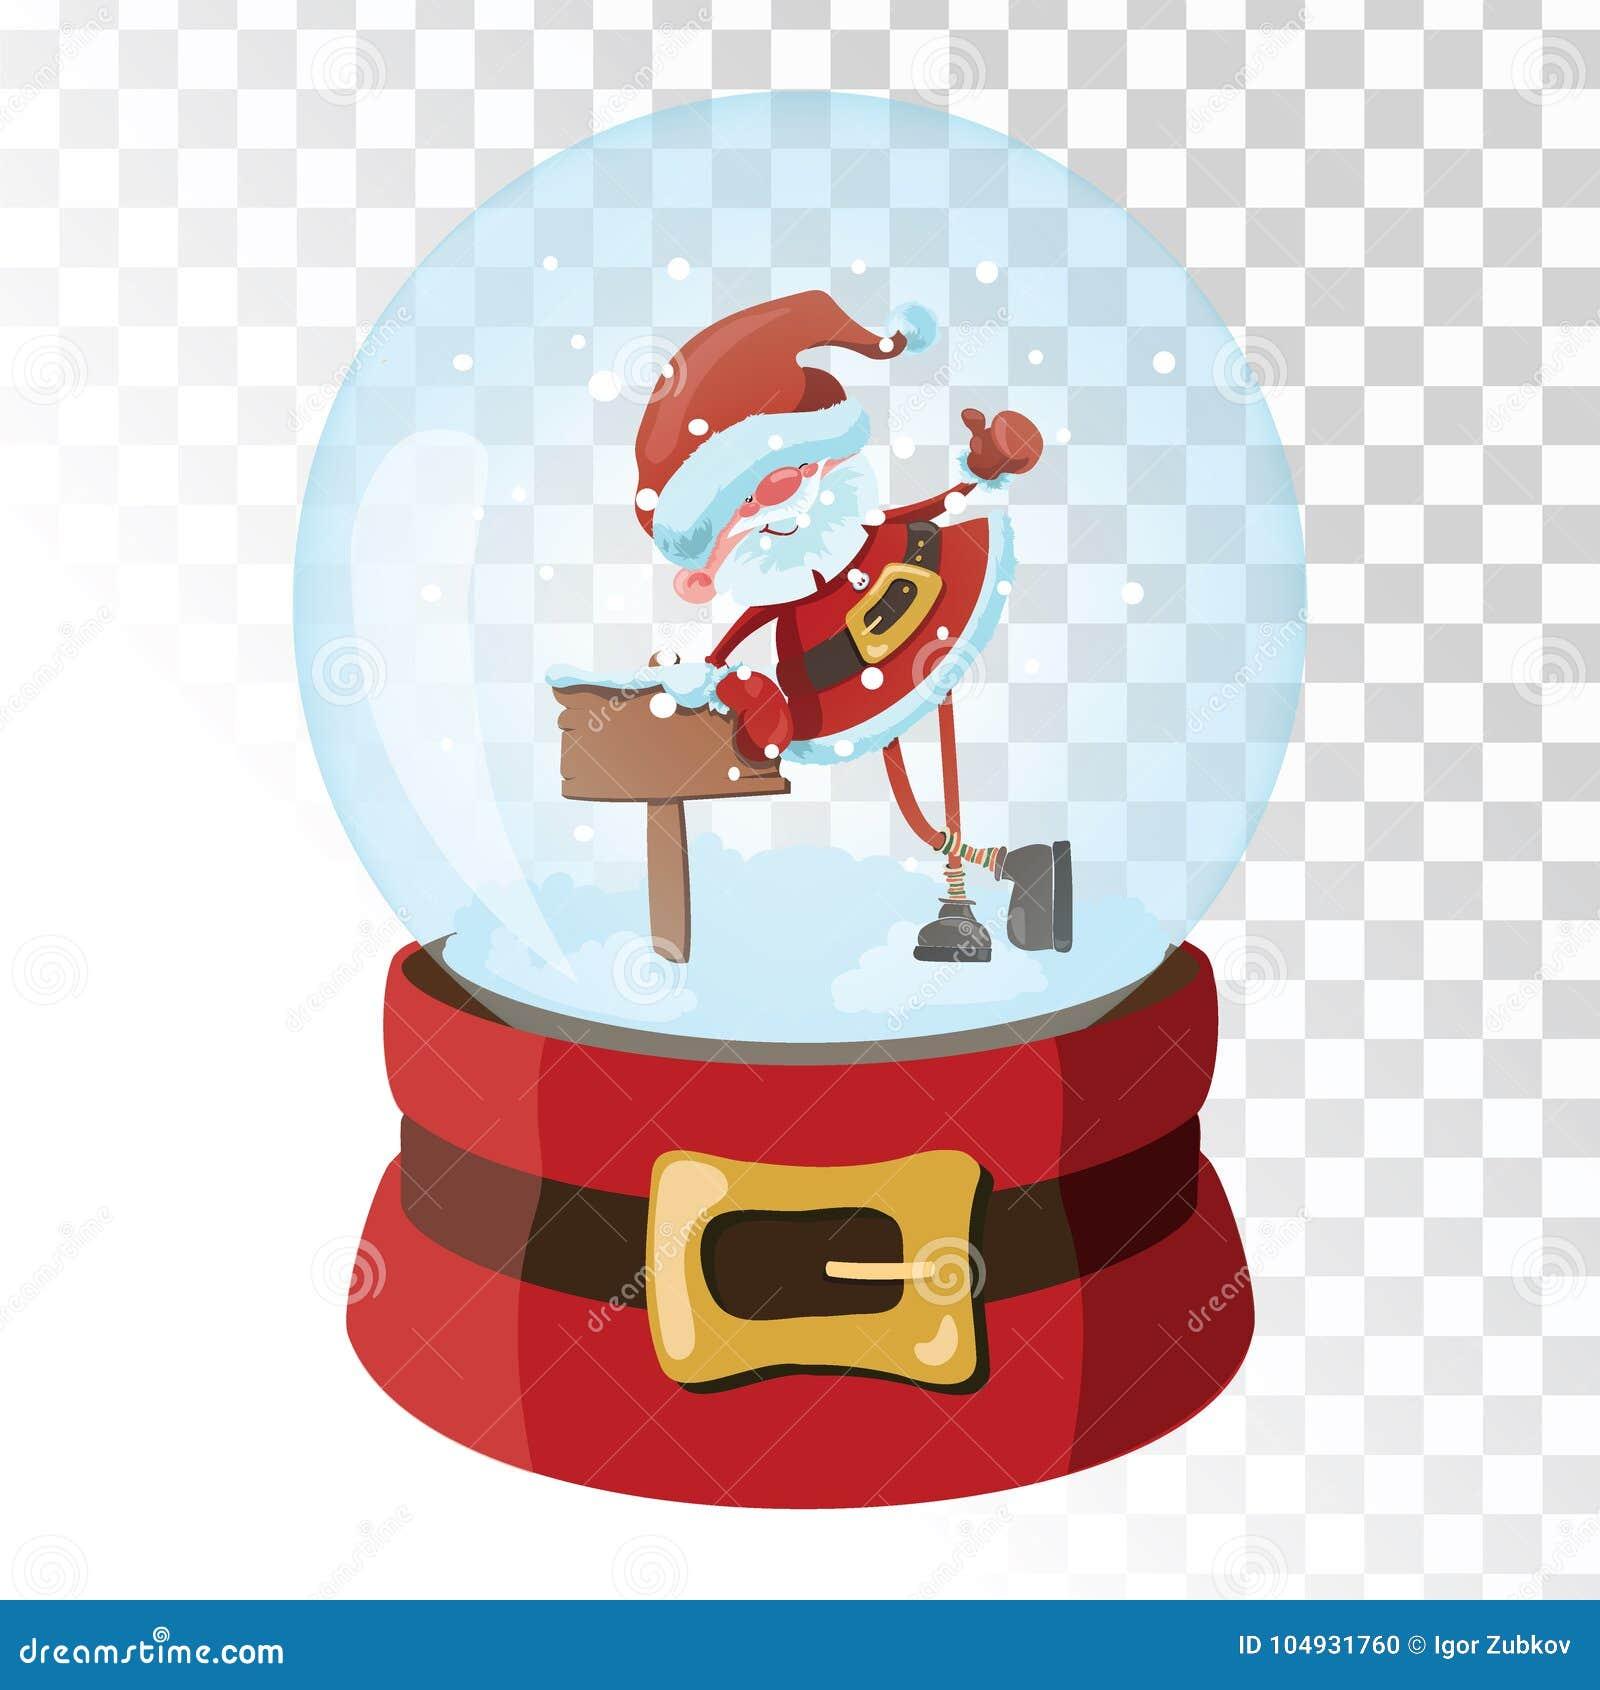 Christmas glass magic ball with santa claus transparent glass christmas glass magic ball with santa claus transparent glass sphere with snowflakes m4hsunfo